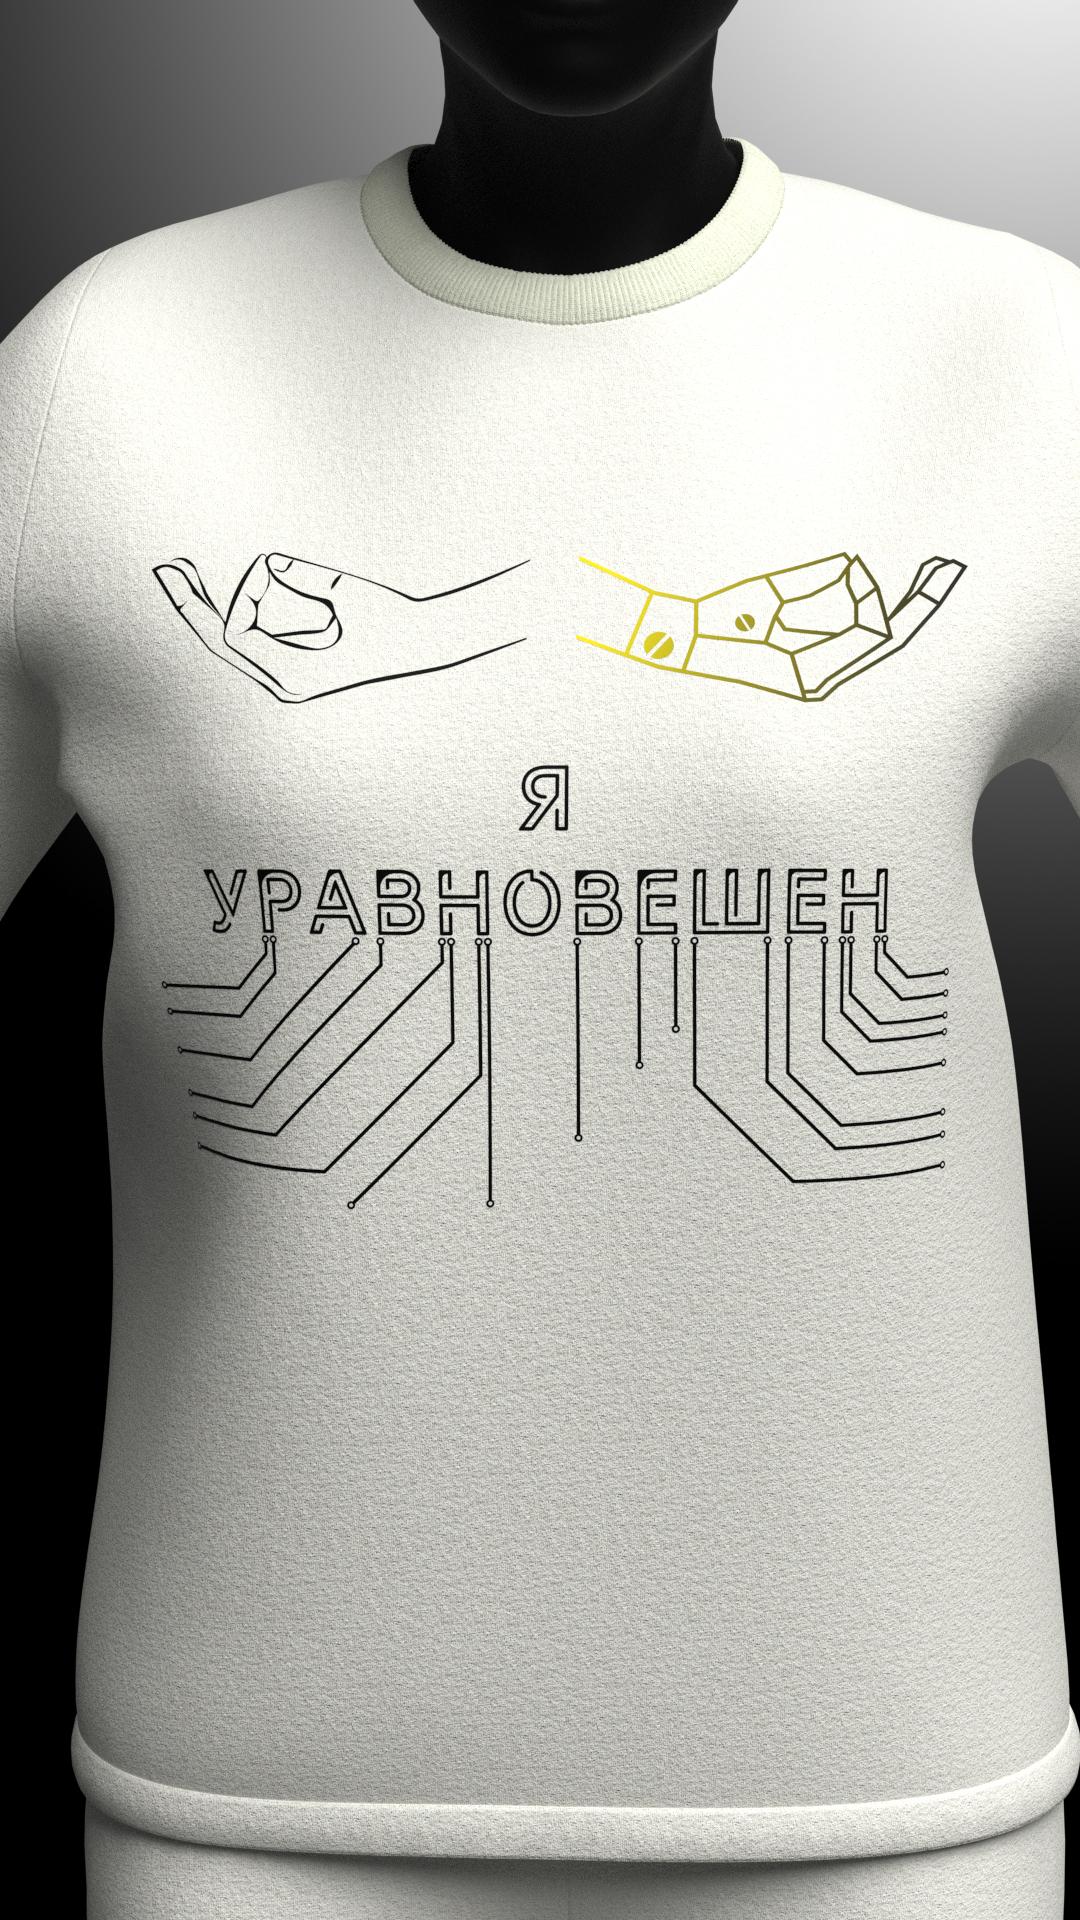 Нарисовать принты на футболки для компании Моторика фото f_44860a00b64a1ae1.jpg